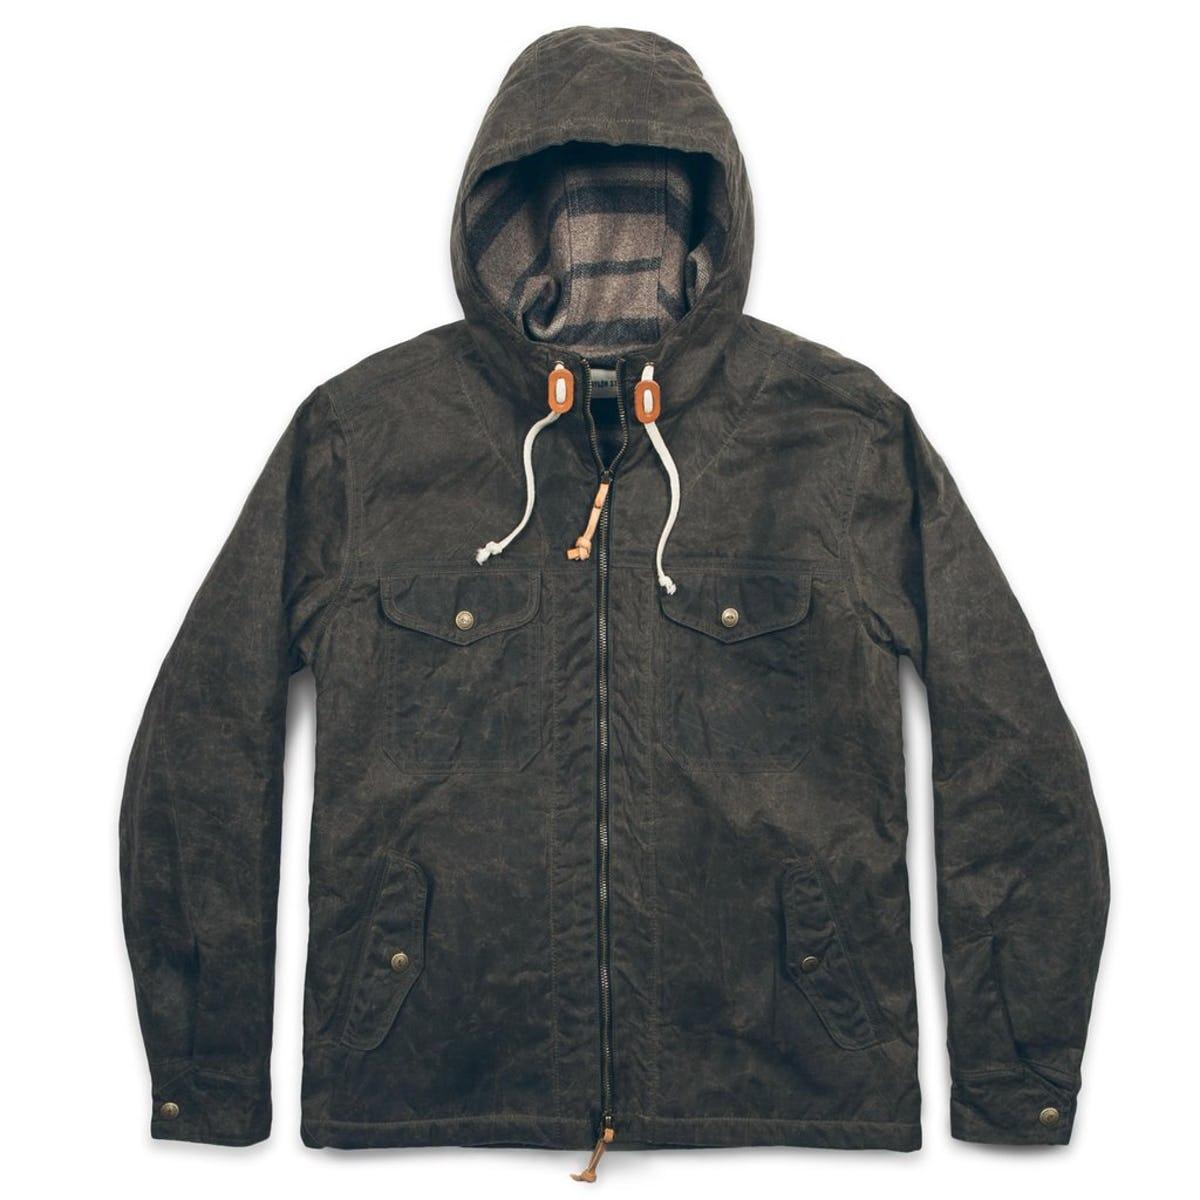 taylor stich winslow jacket.jpg